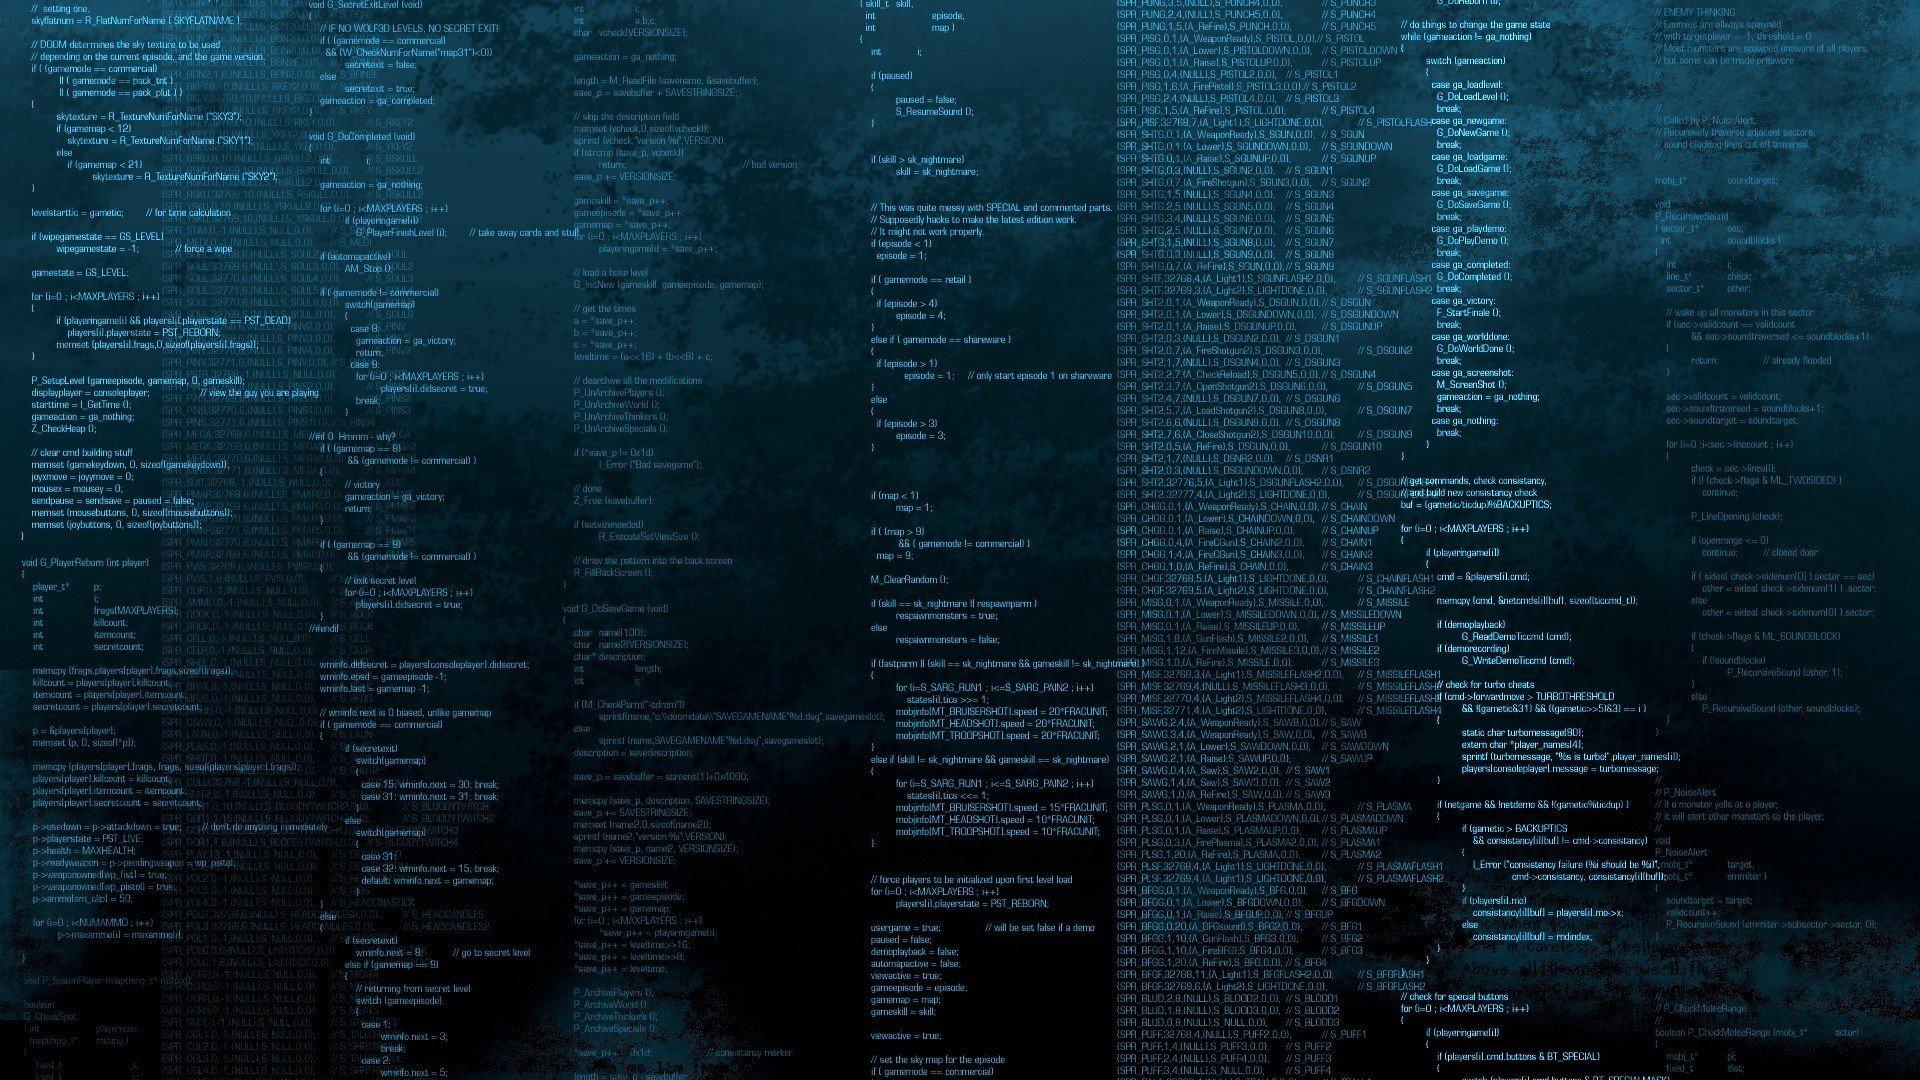 50] Desktop Wallpaper Programs on WallpaperSafari 1920x1080